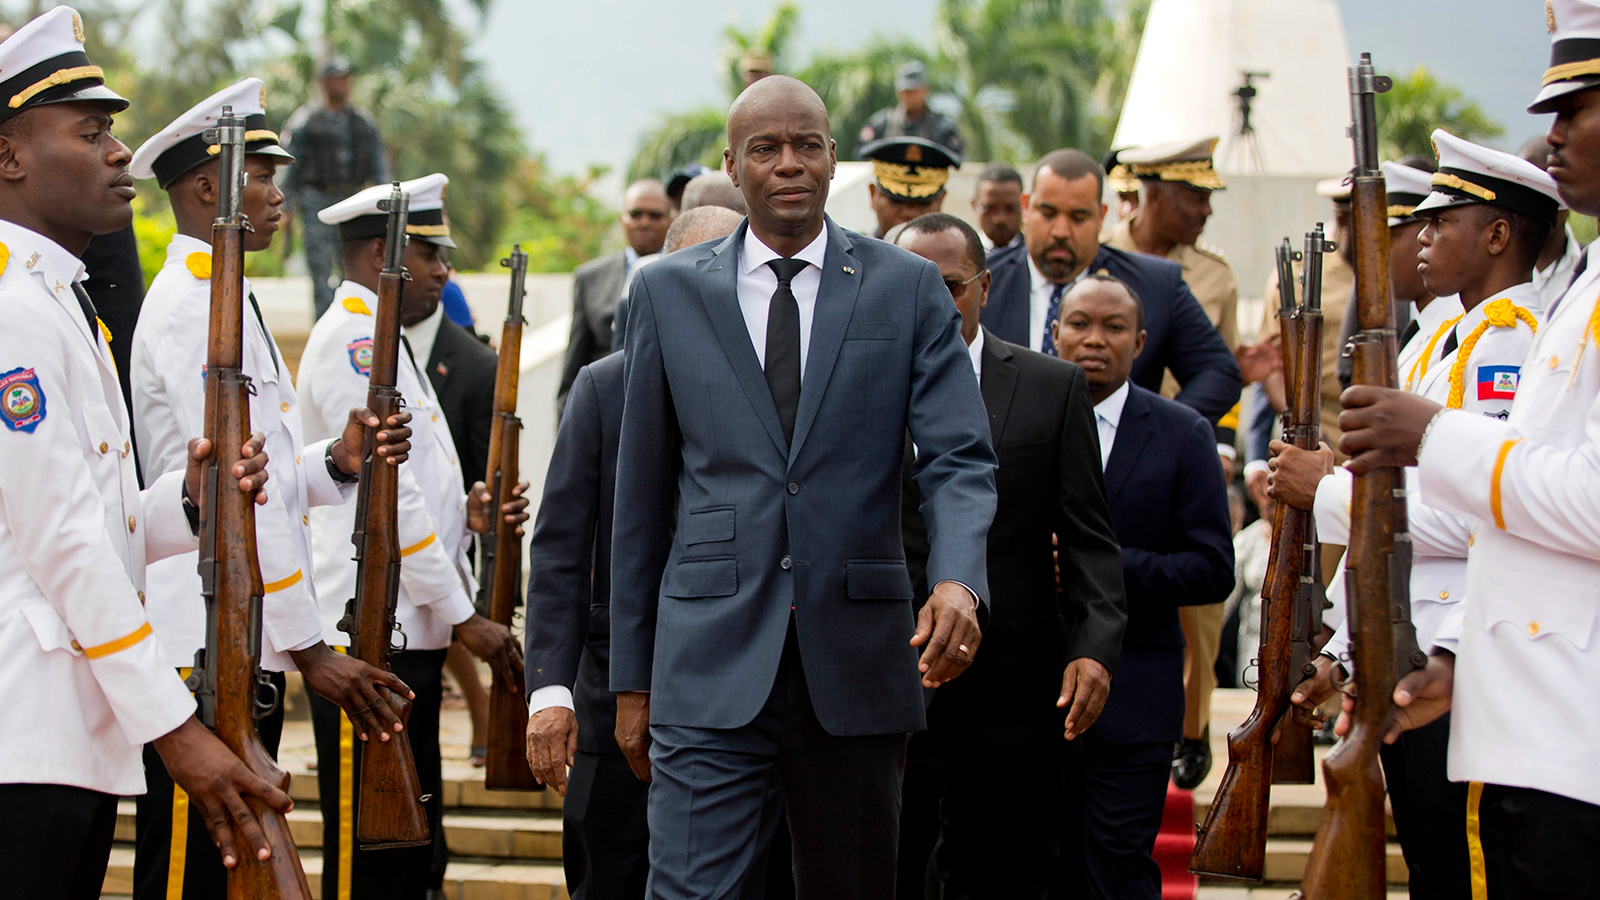 Minuto a minuto: Asesinan al presidente de Haití Jovenel Moïse | CNN